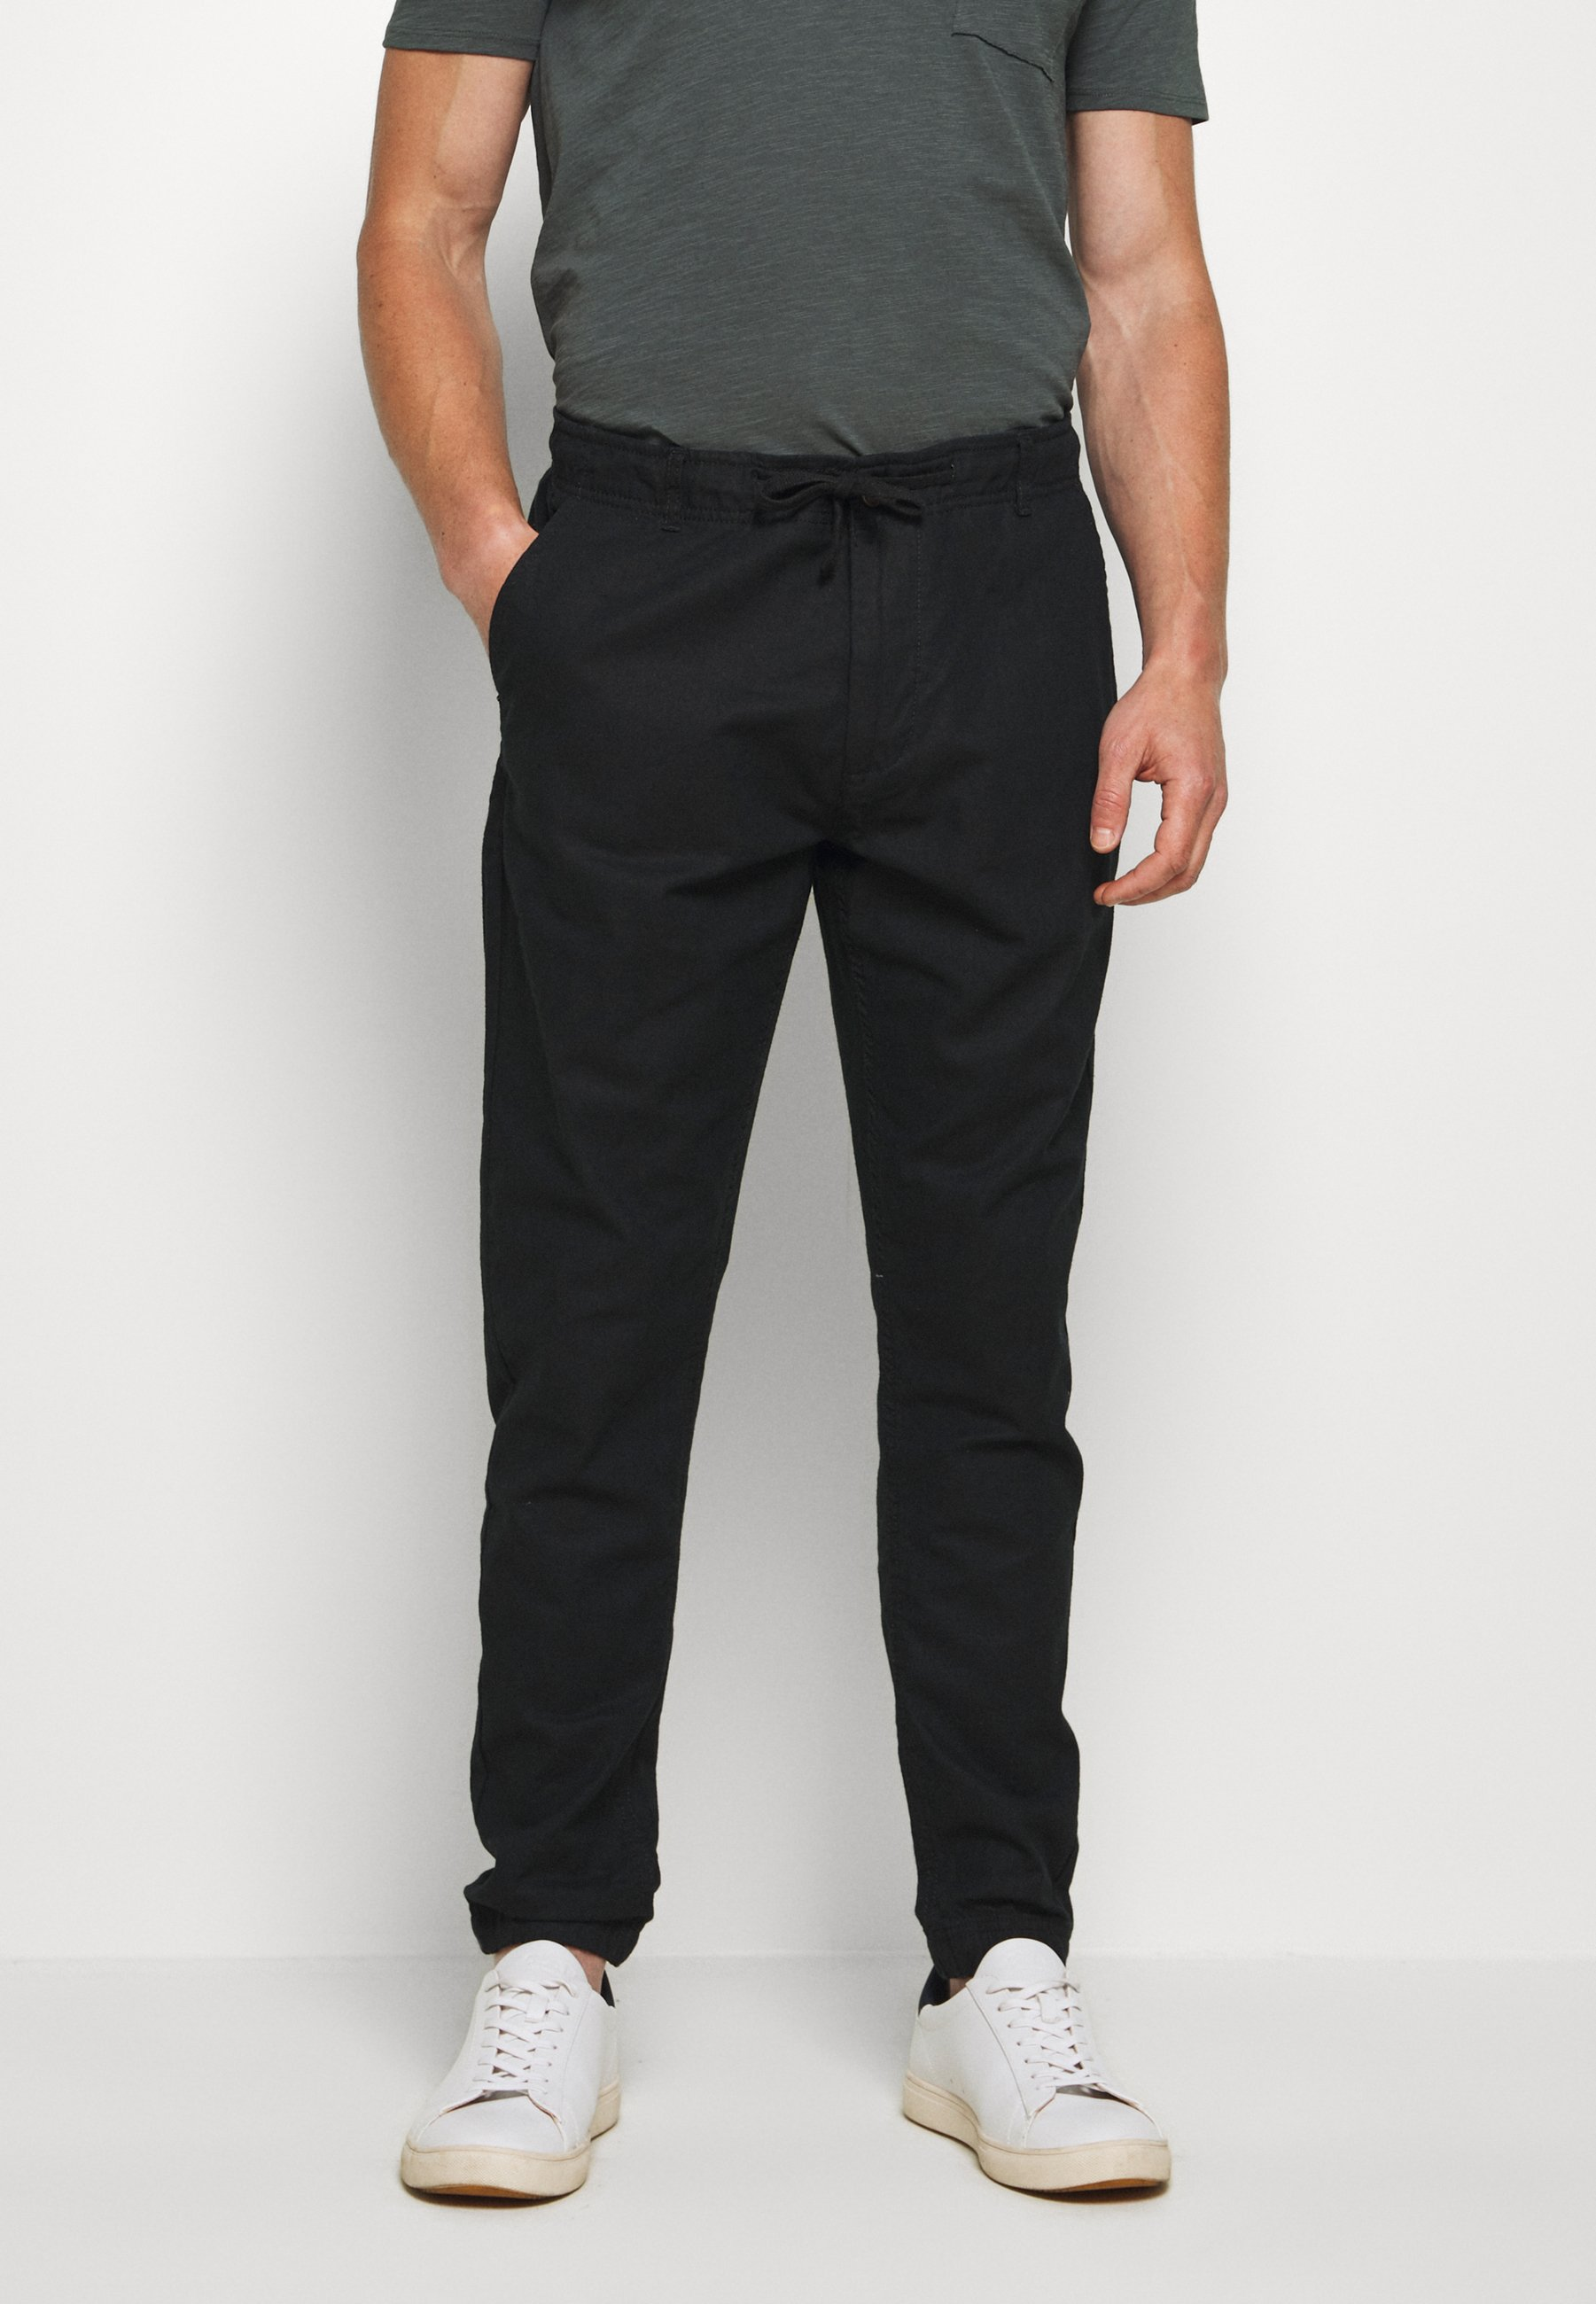 Uomo VIBORG - Pantaloni